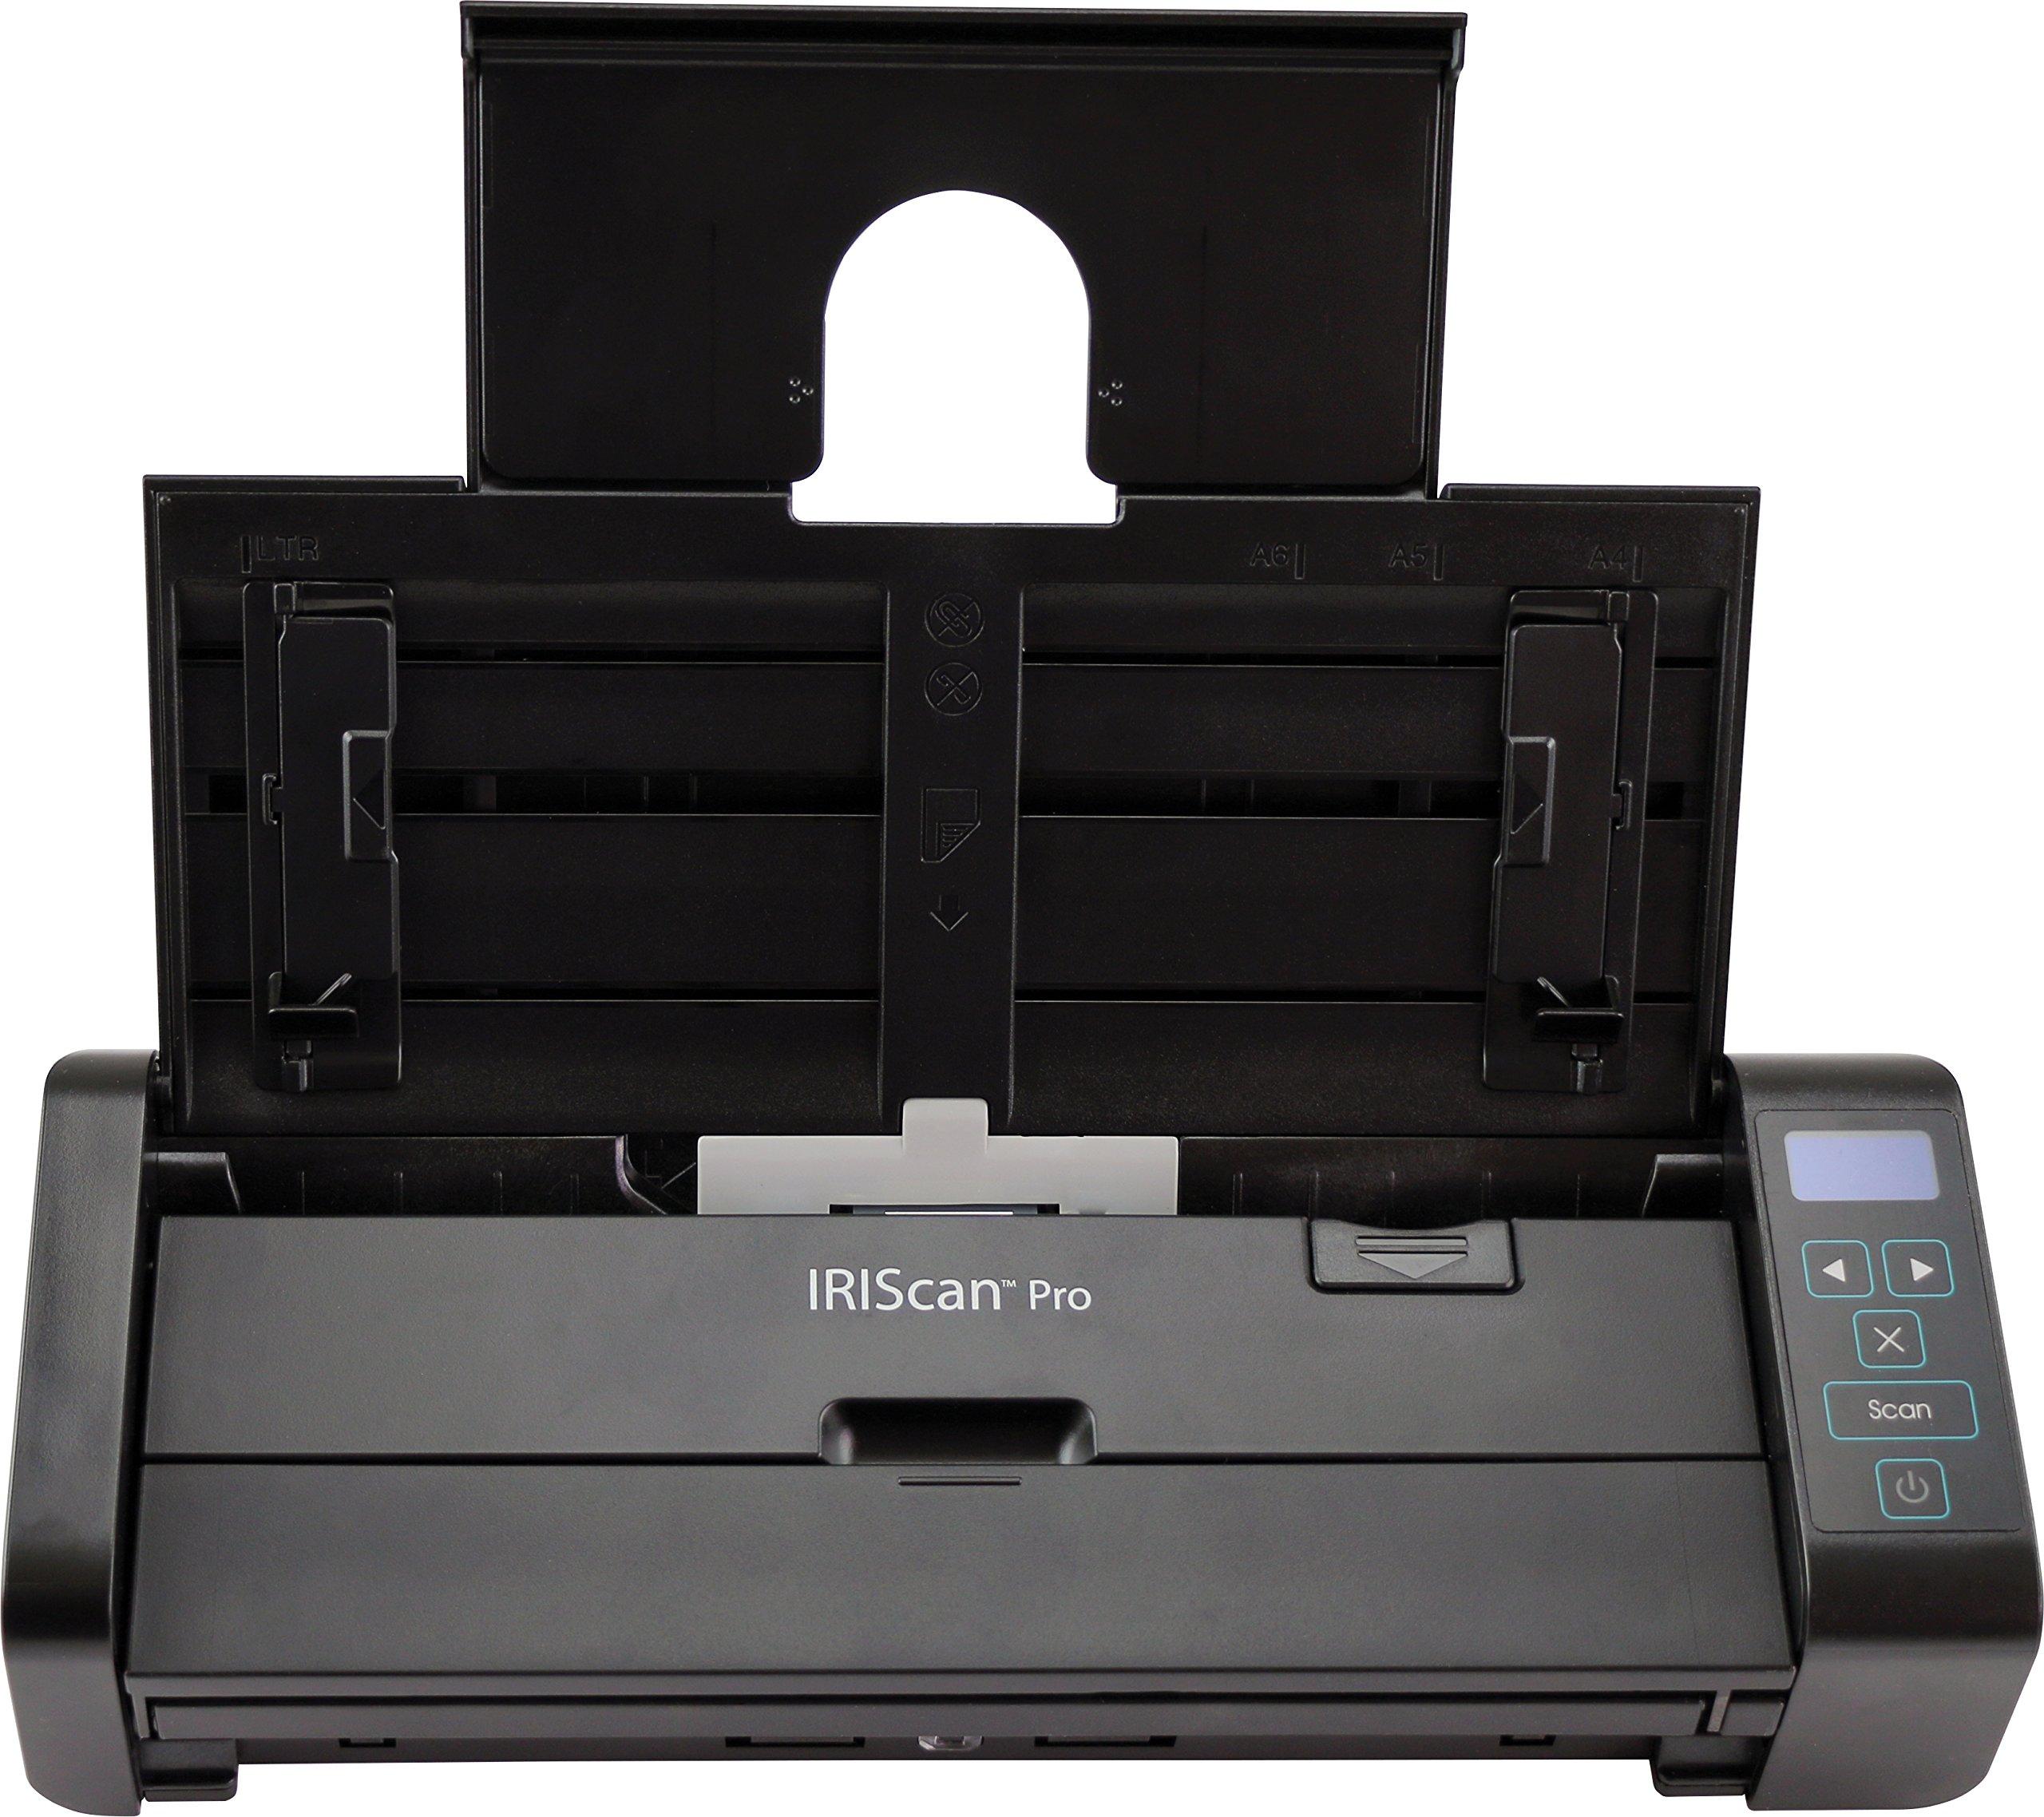 I.R.I.S. IRIScan Pro 459 Sheetfed Scanner - 600 dpi Optical